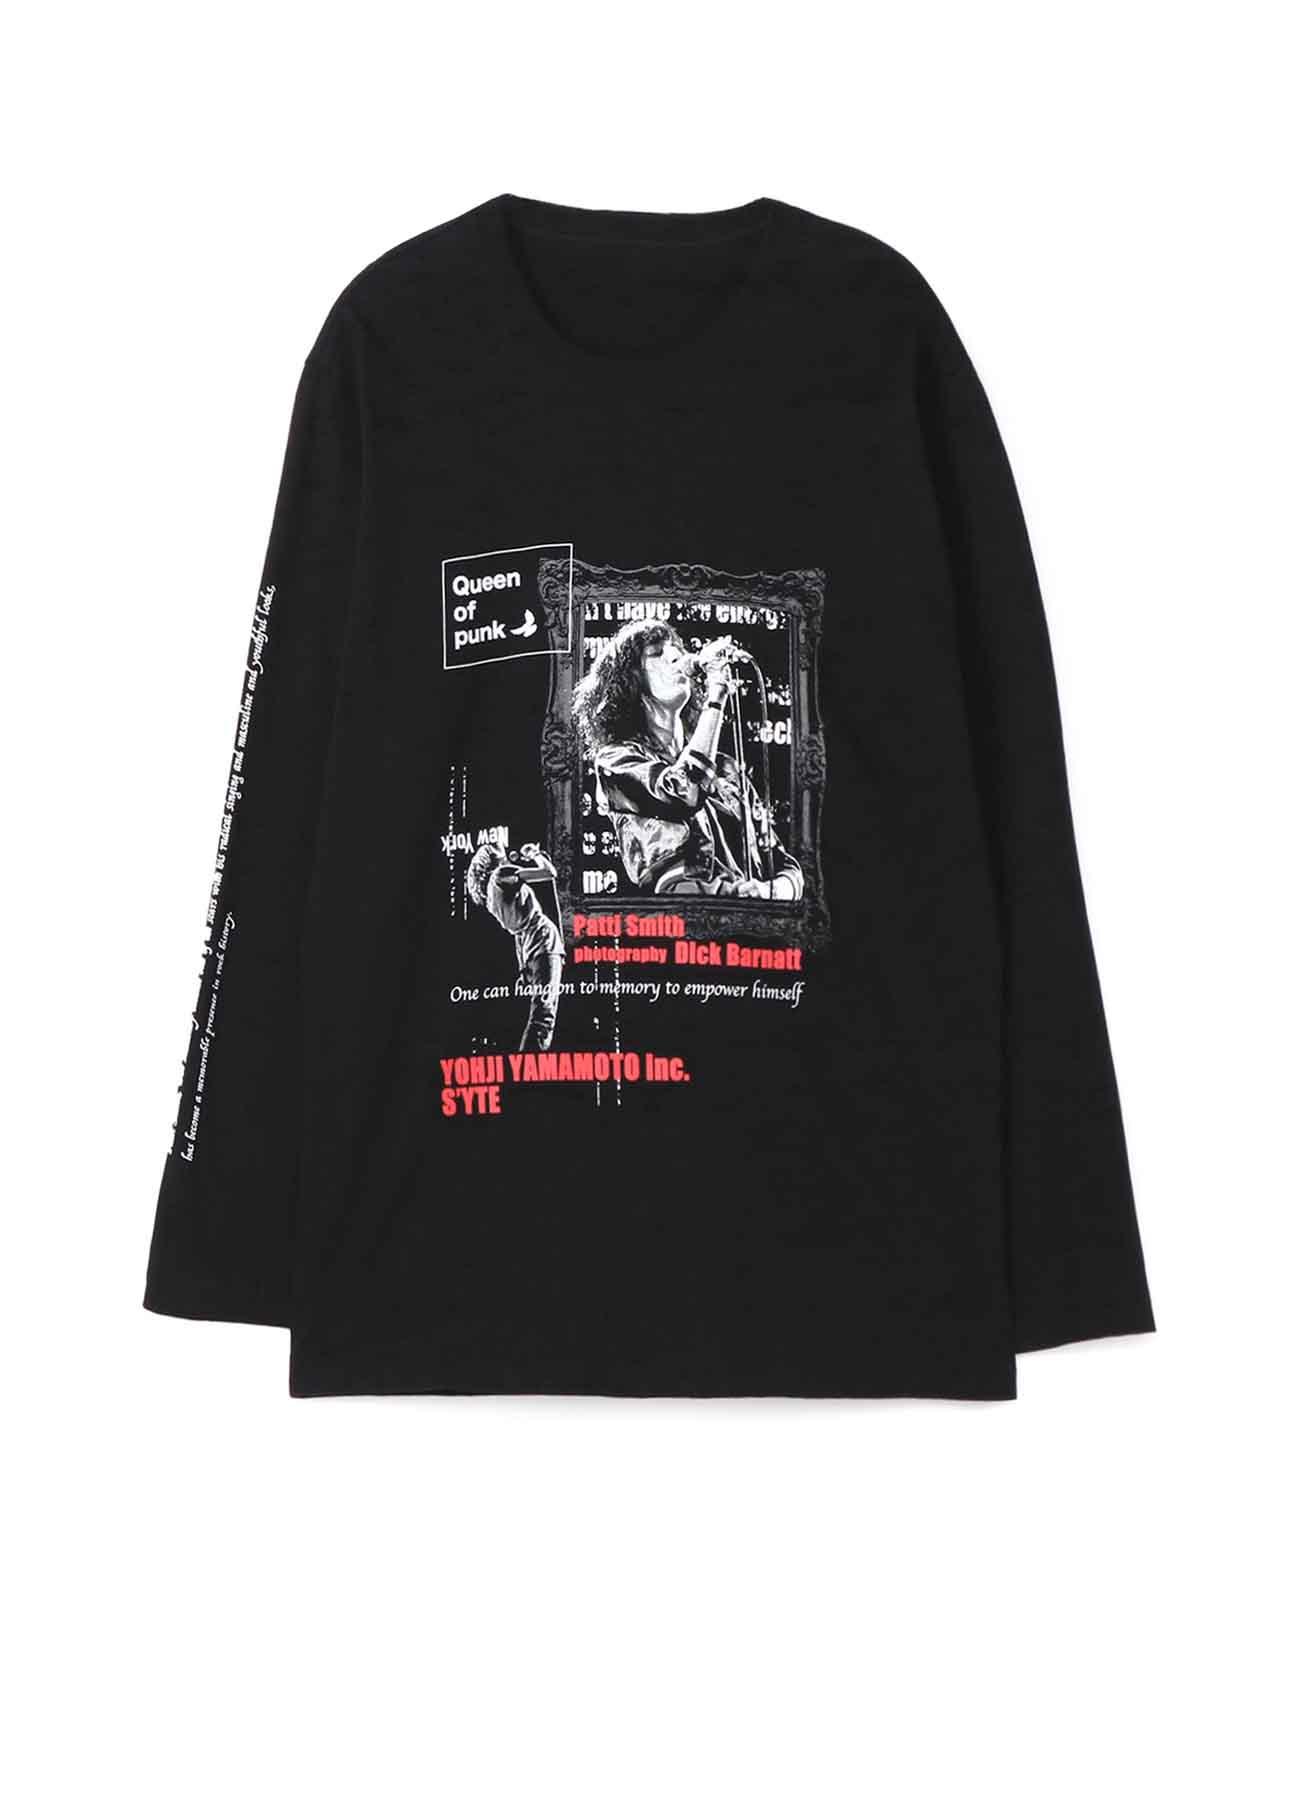 S'YTE × Dick Barnatt / Patti Smith Long Sleeve T-shirt